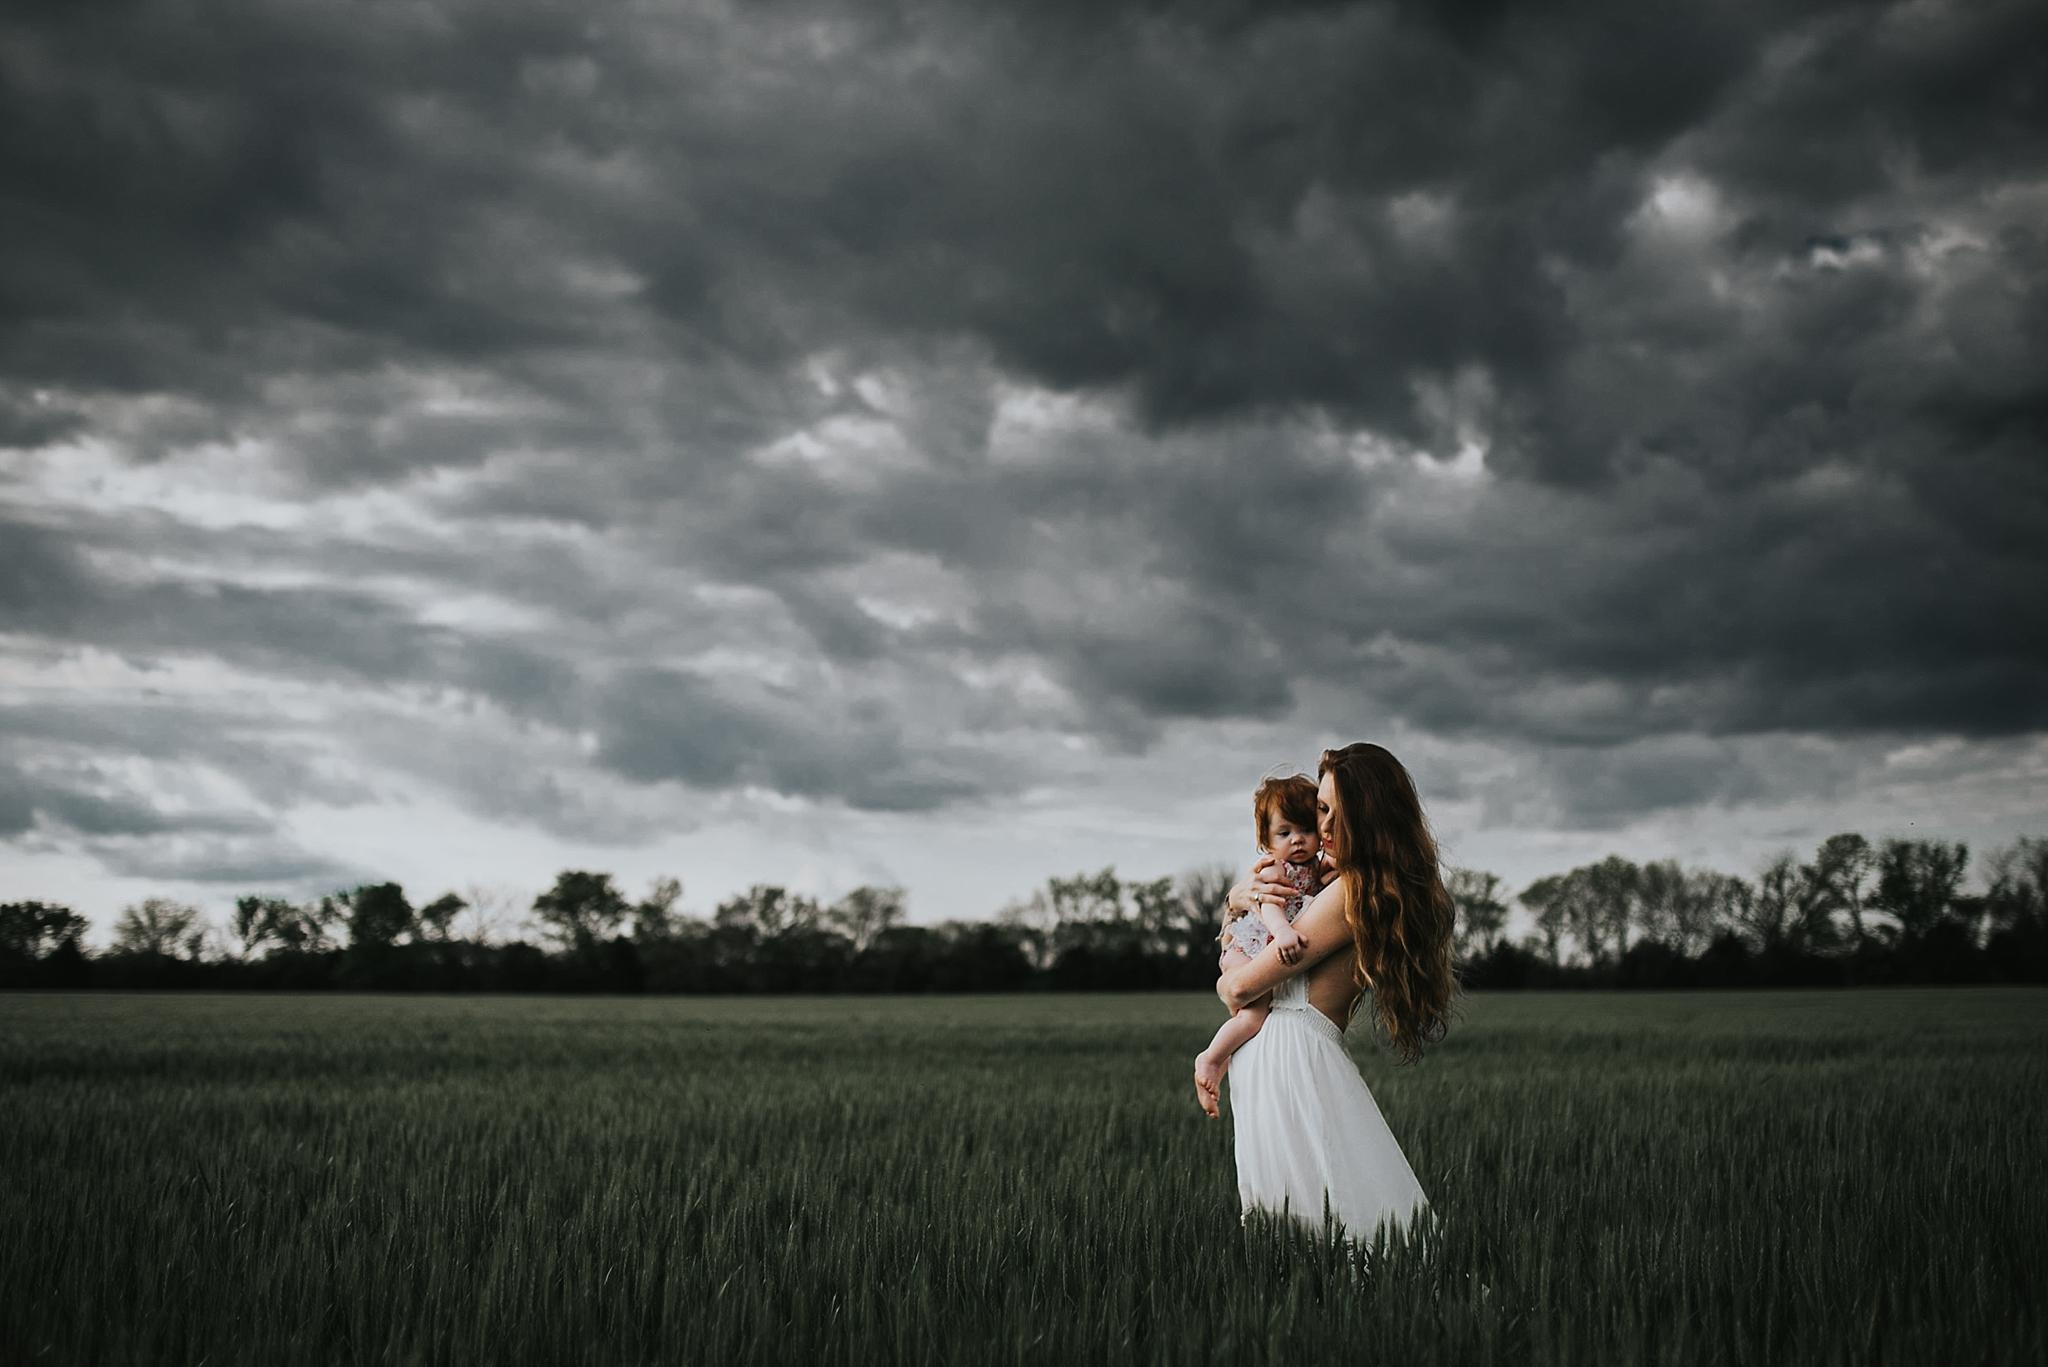 twyla jones photography - mother daughter - field and forest-4594_treasure coast florida.jpg